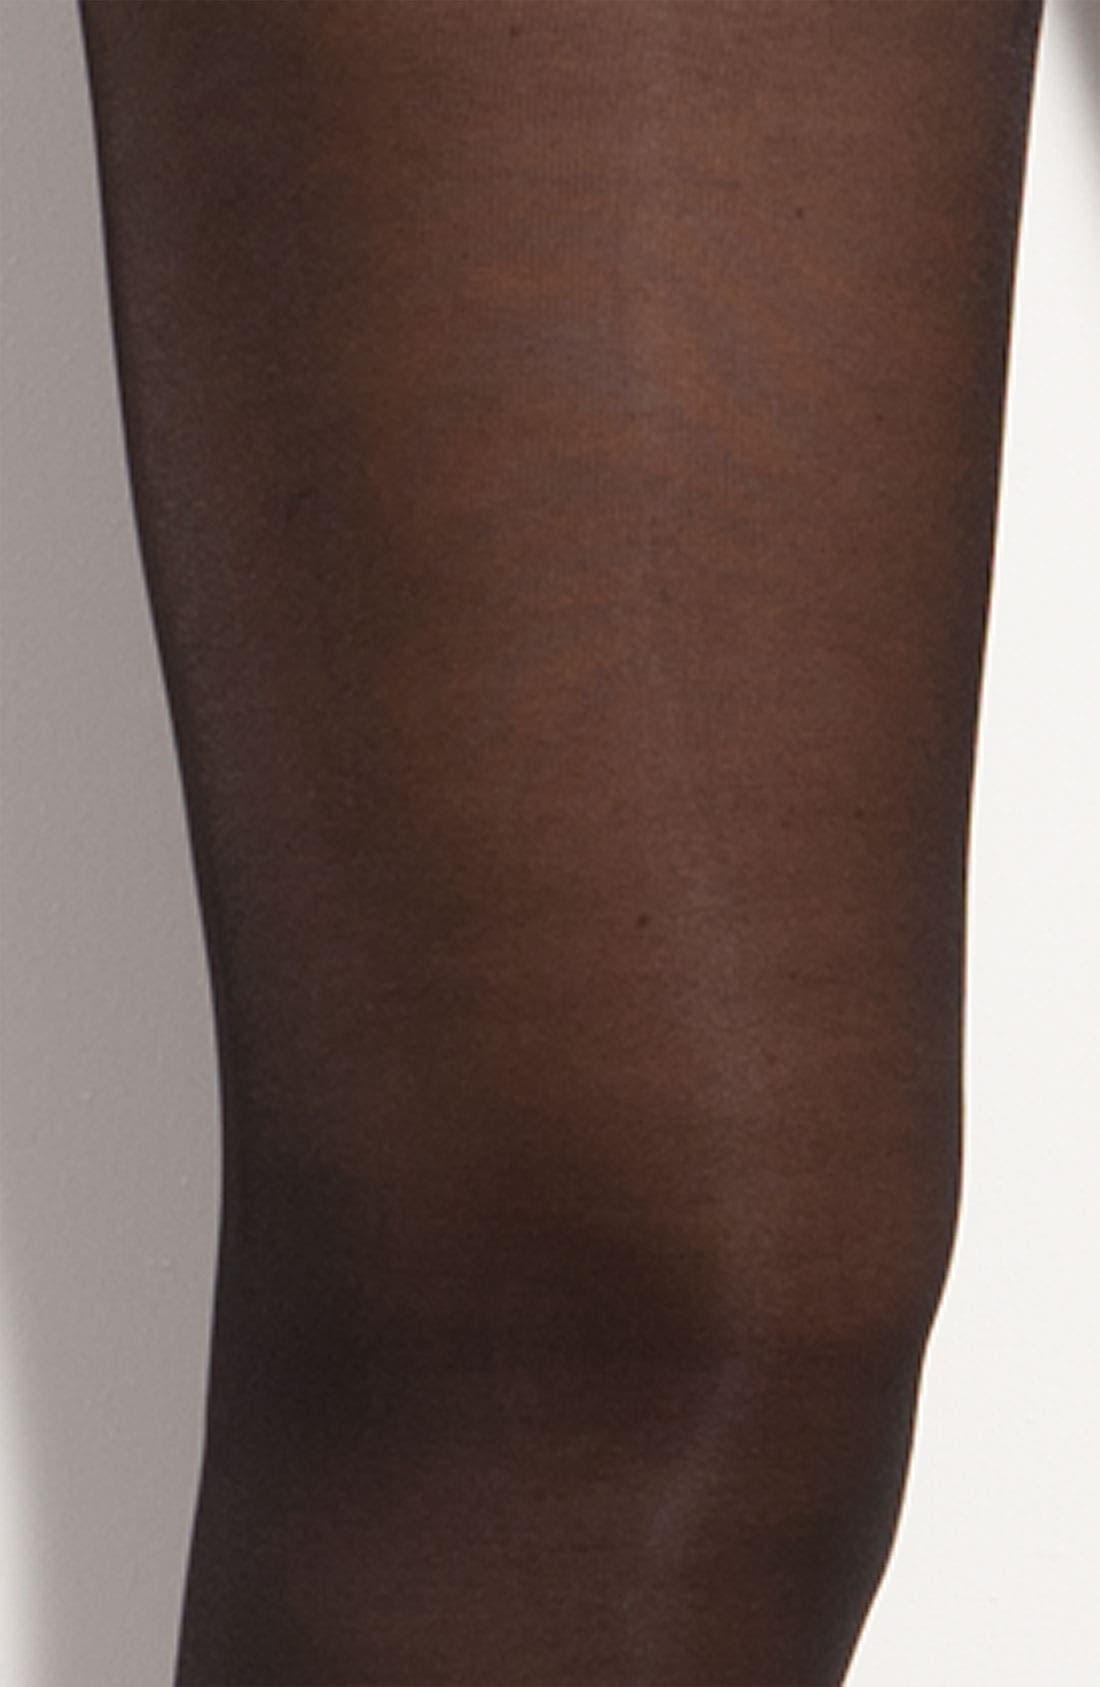 Alternate Image 2  - Oroblu 'Massage 70' Stockings